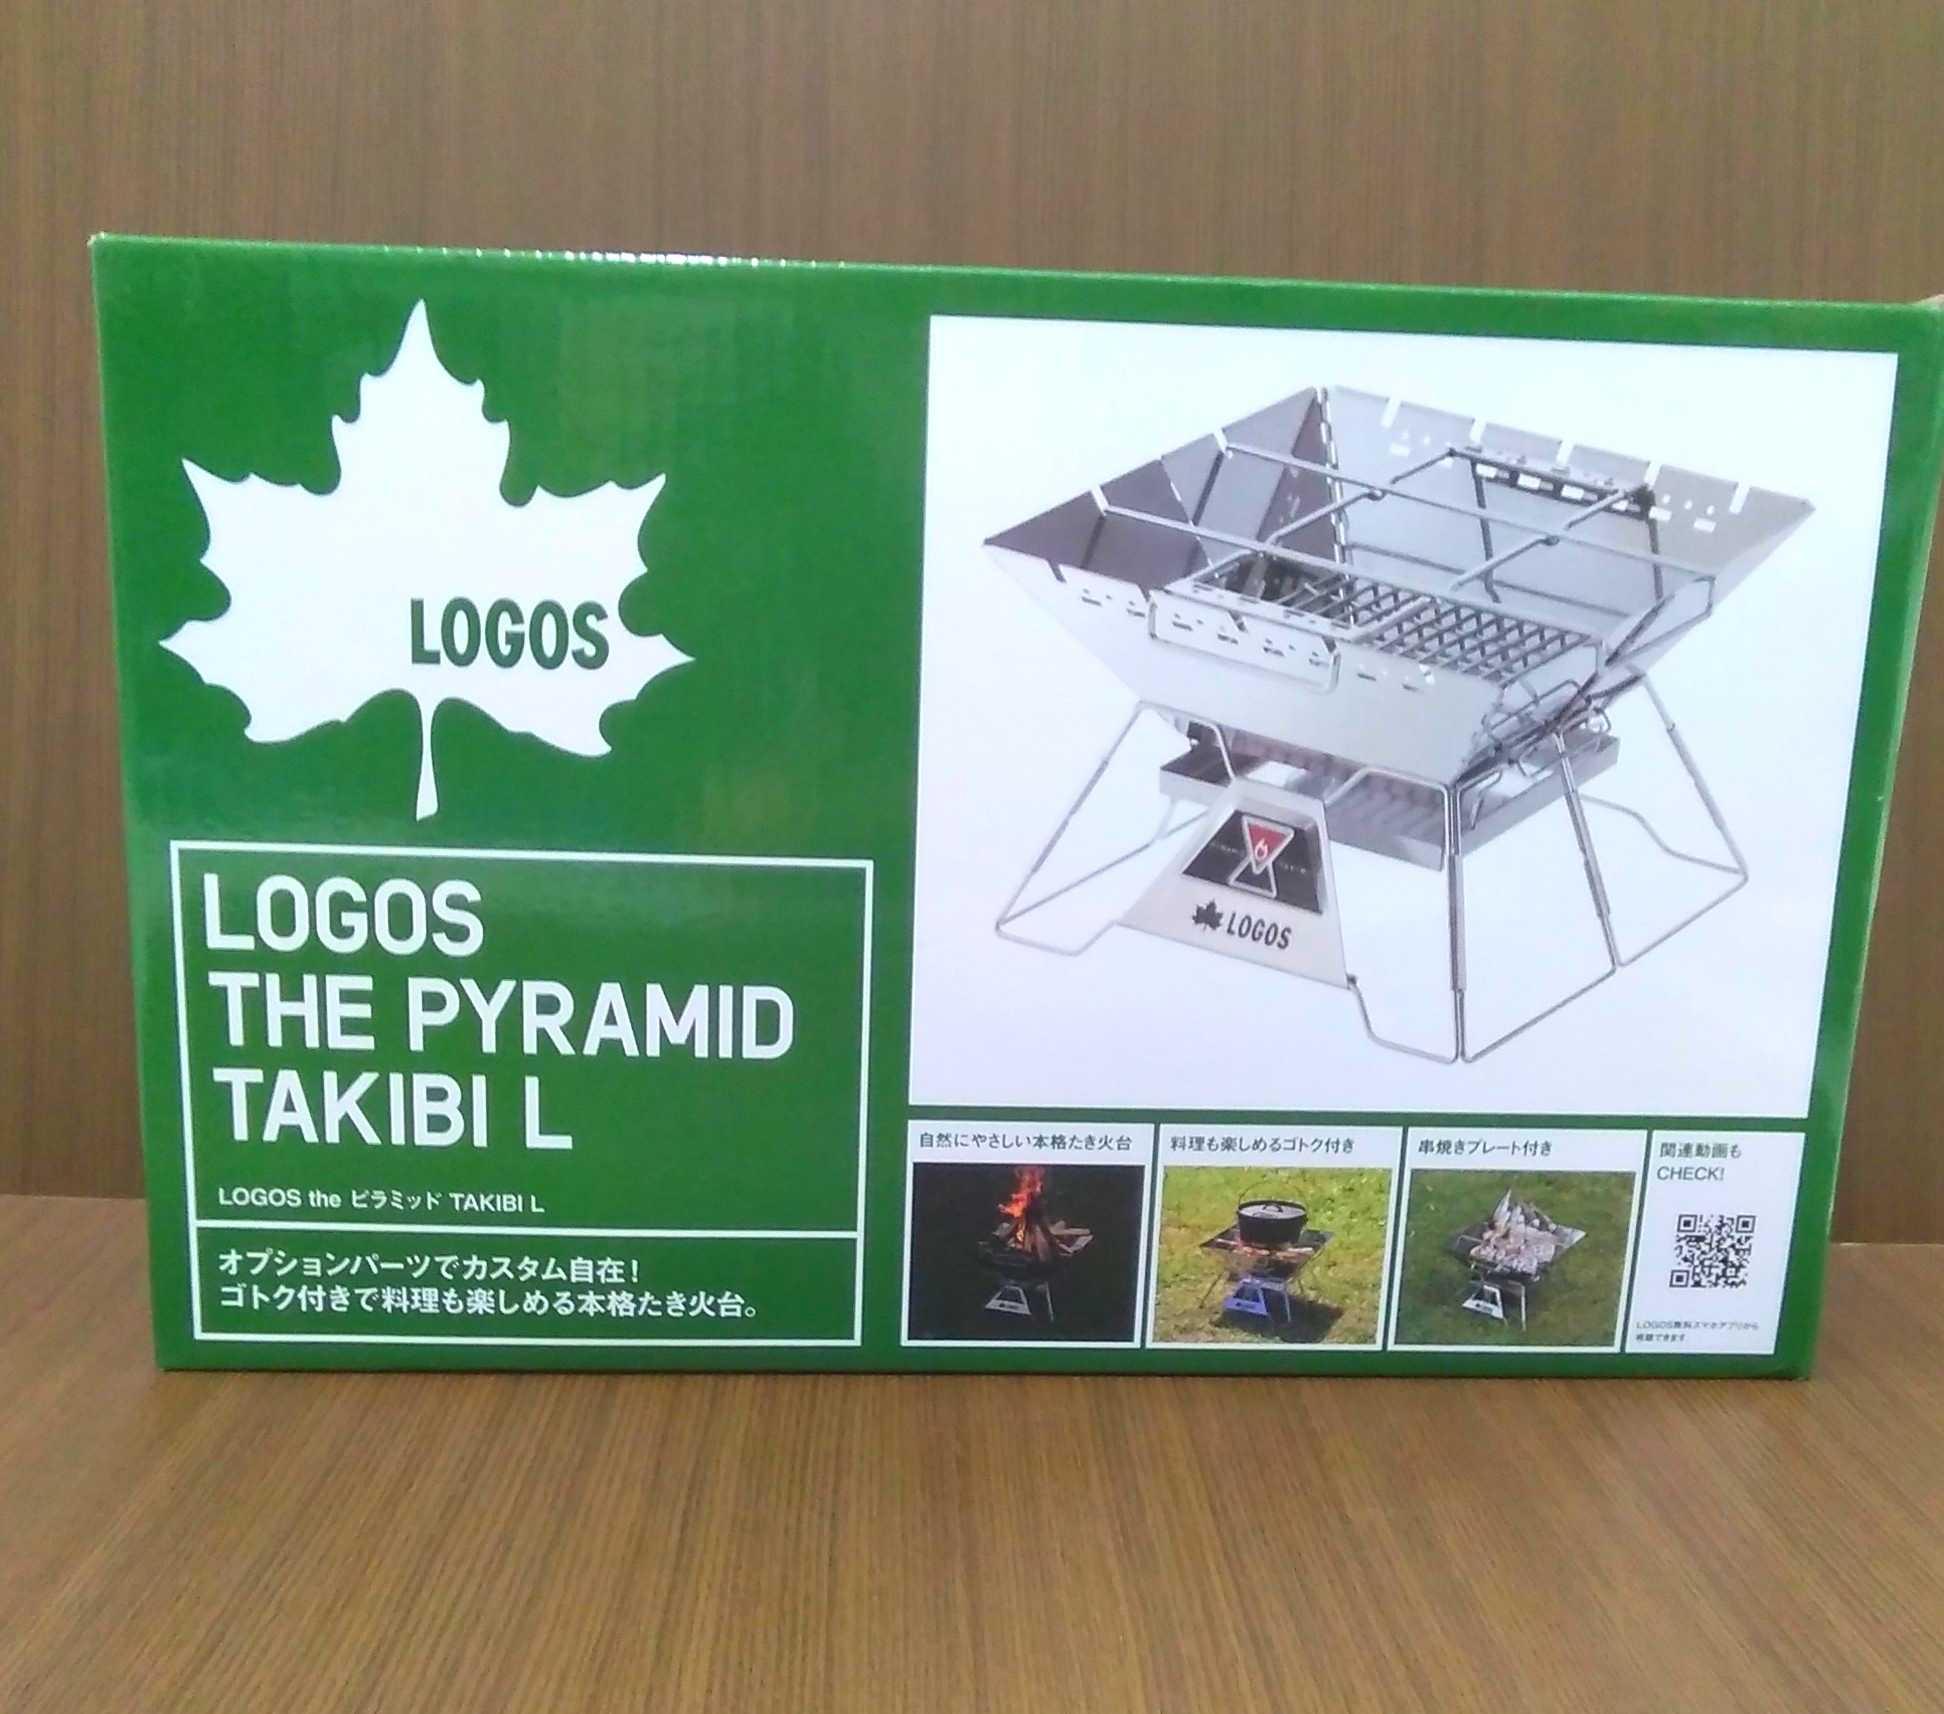 THE PYRAMID TAKIBI L|LOGOS